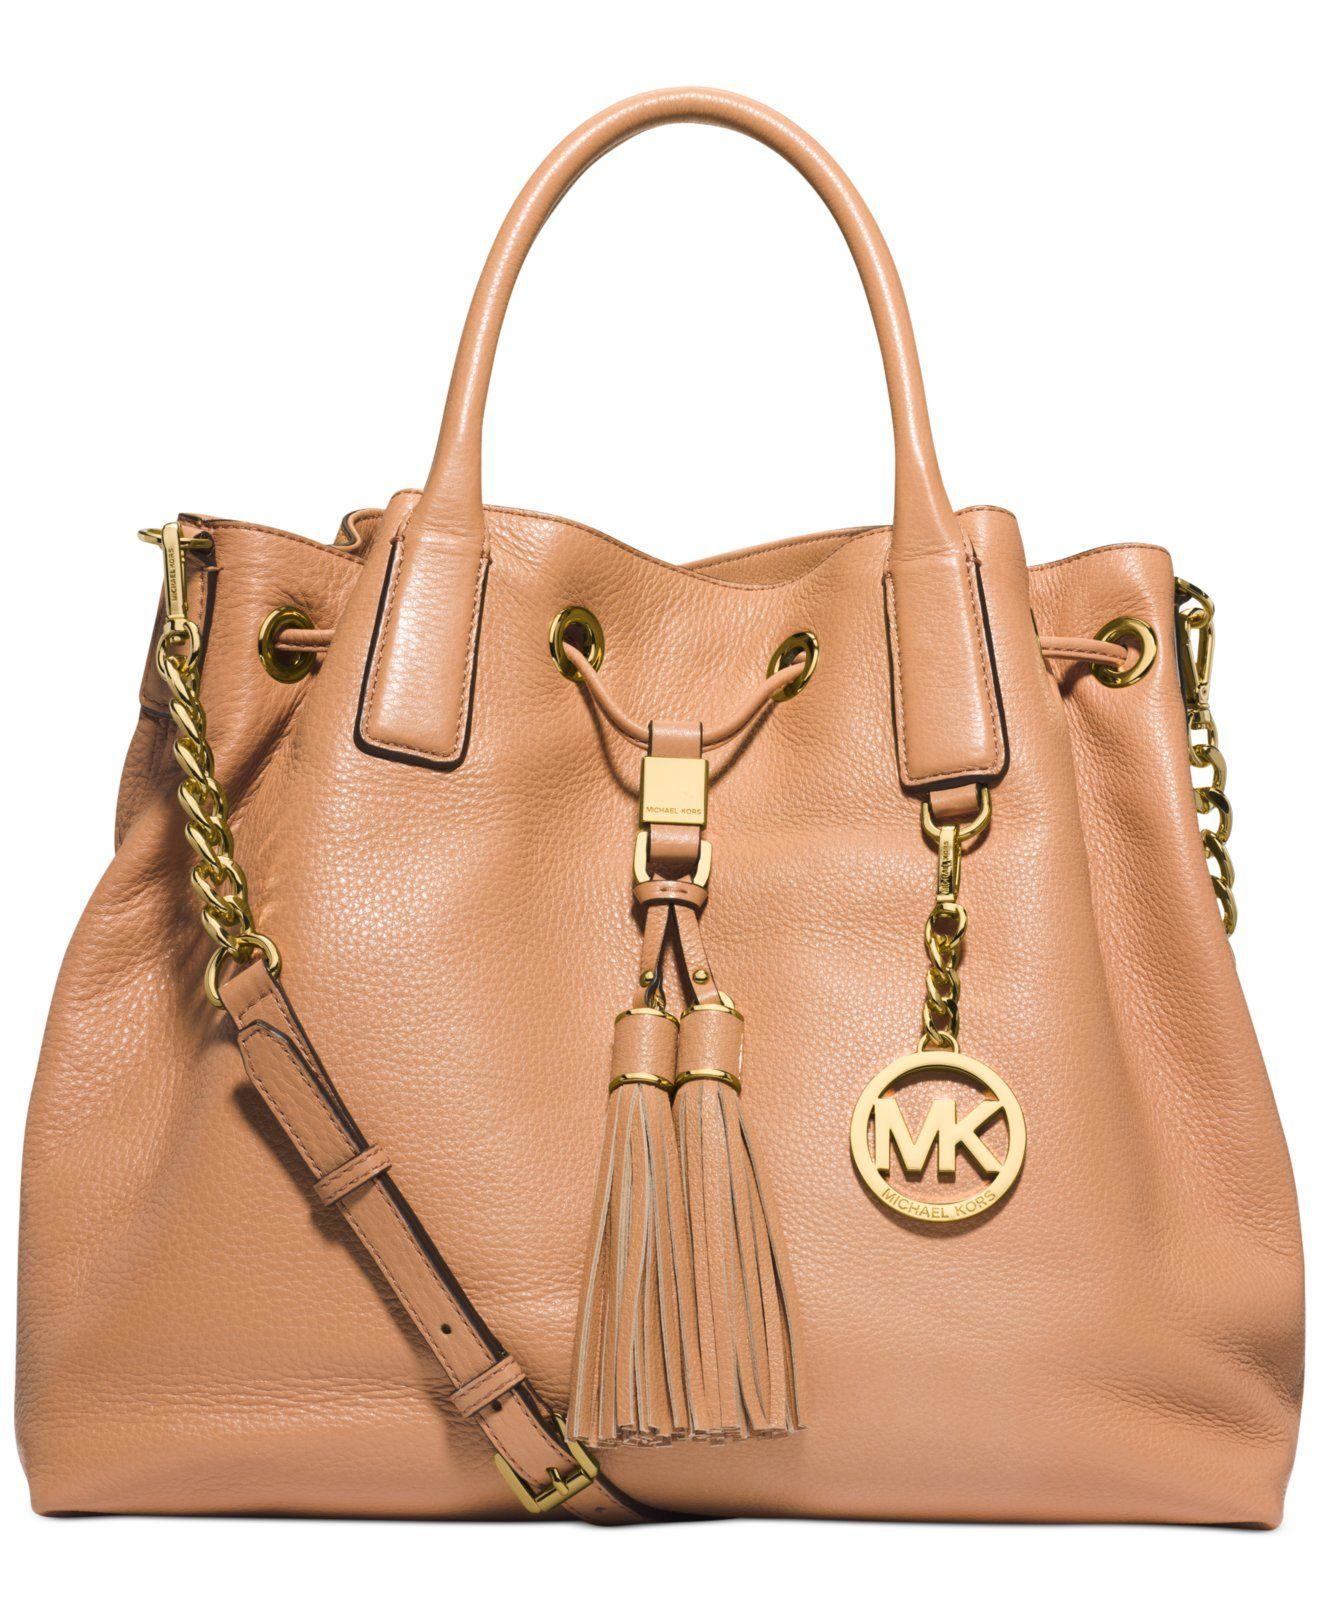 ce59b52735fb4 MICHAEL Michael Kors Camden Large Drawstring Satchel - Michael Kors  Handbags - Handbags   Accessories - Macy s